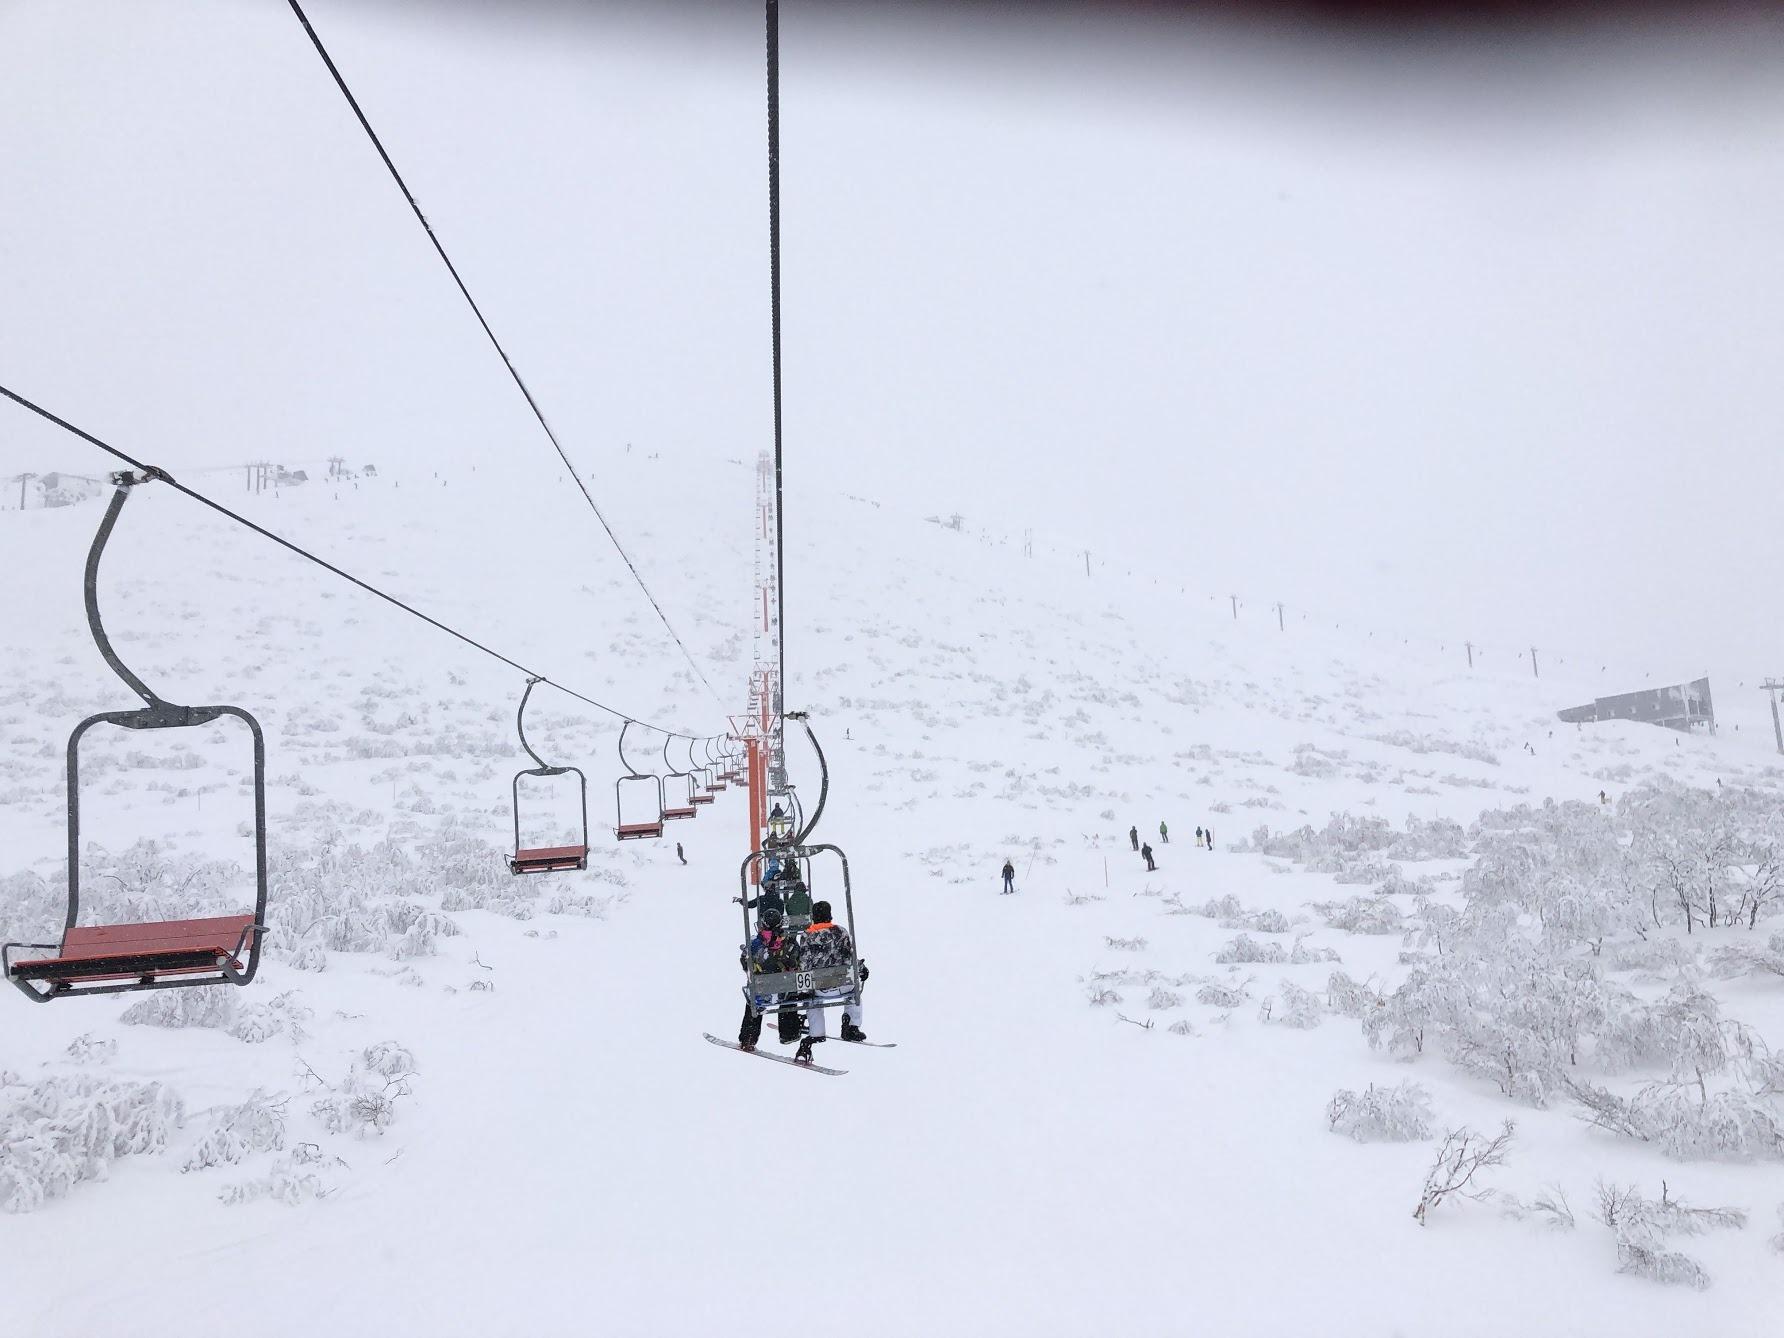 20200203_hokkaido_niseko_snowboard_04.jpg